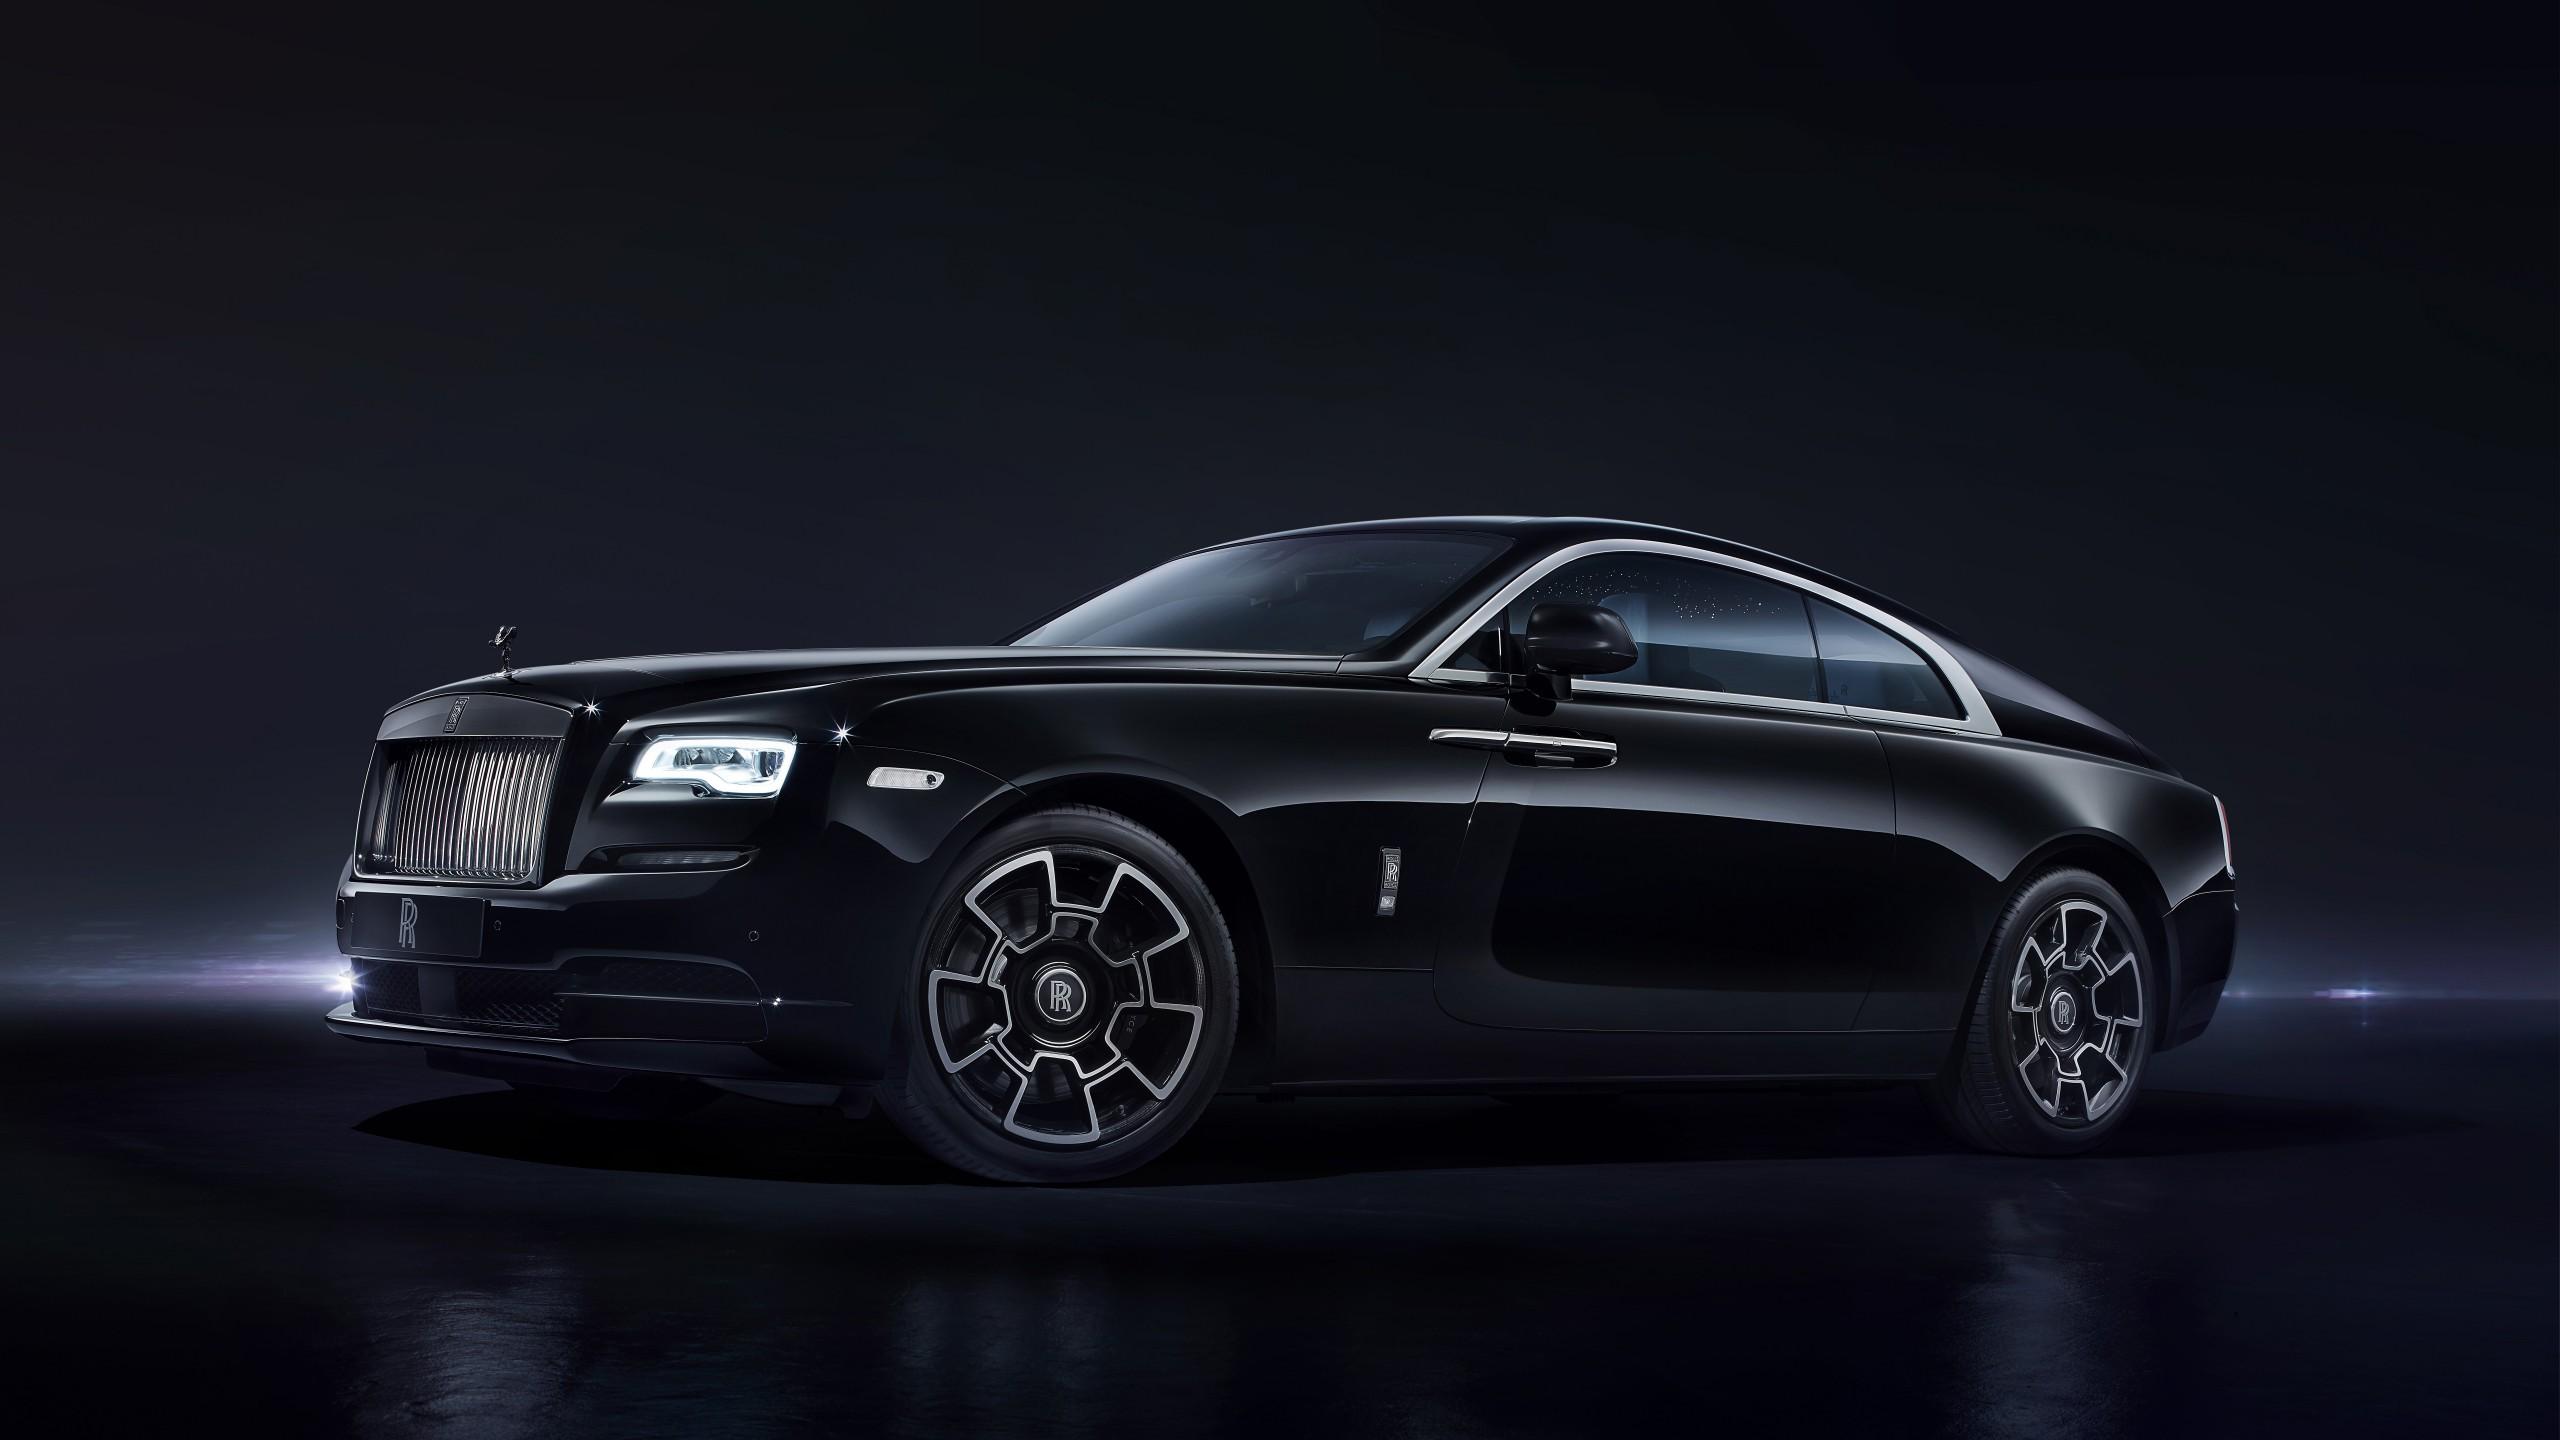 Wallpaper 1600x1200 3d Rolls Royce Wraith Black Badge Geneva 2016 Wallpapers Hd